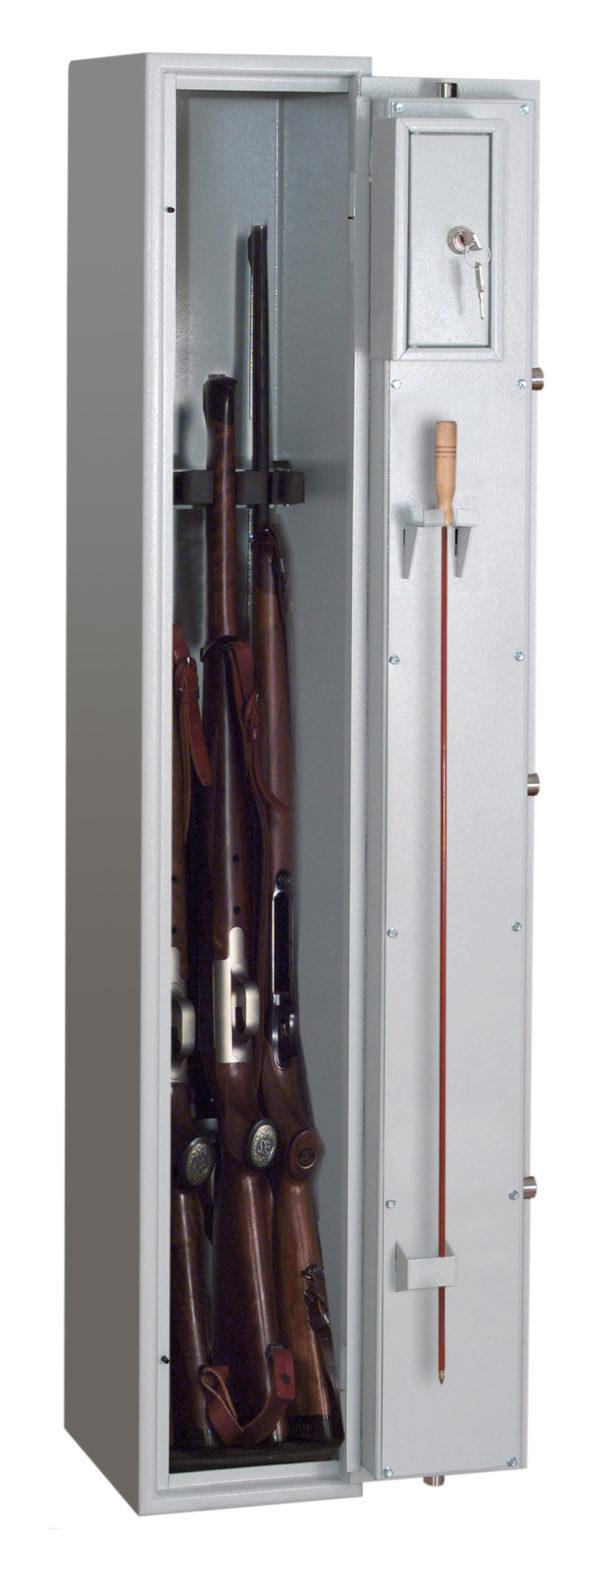 Waffenschrank ISS Remscheid Sicherheitsstufe A.01